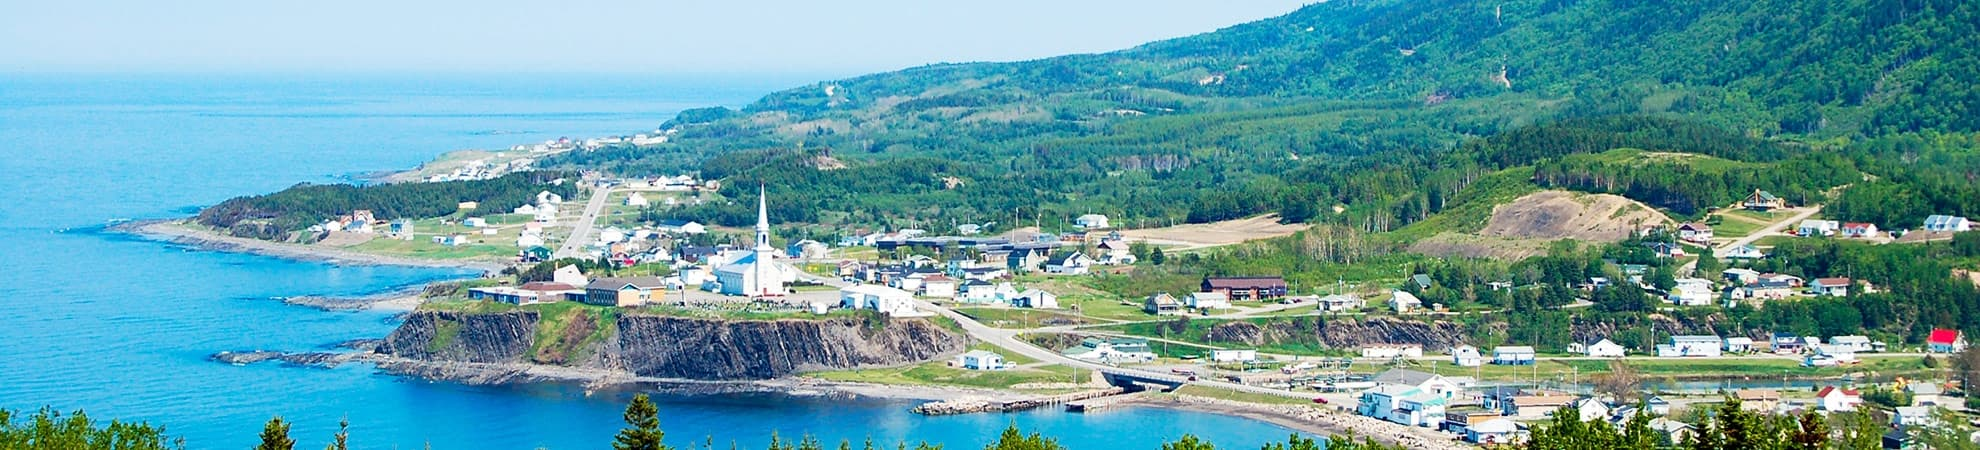 Voyage Gaspé